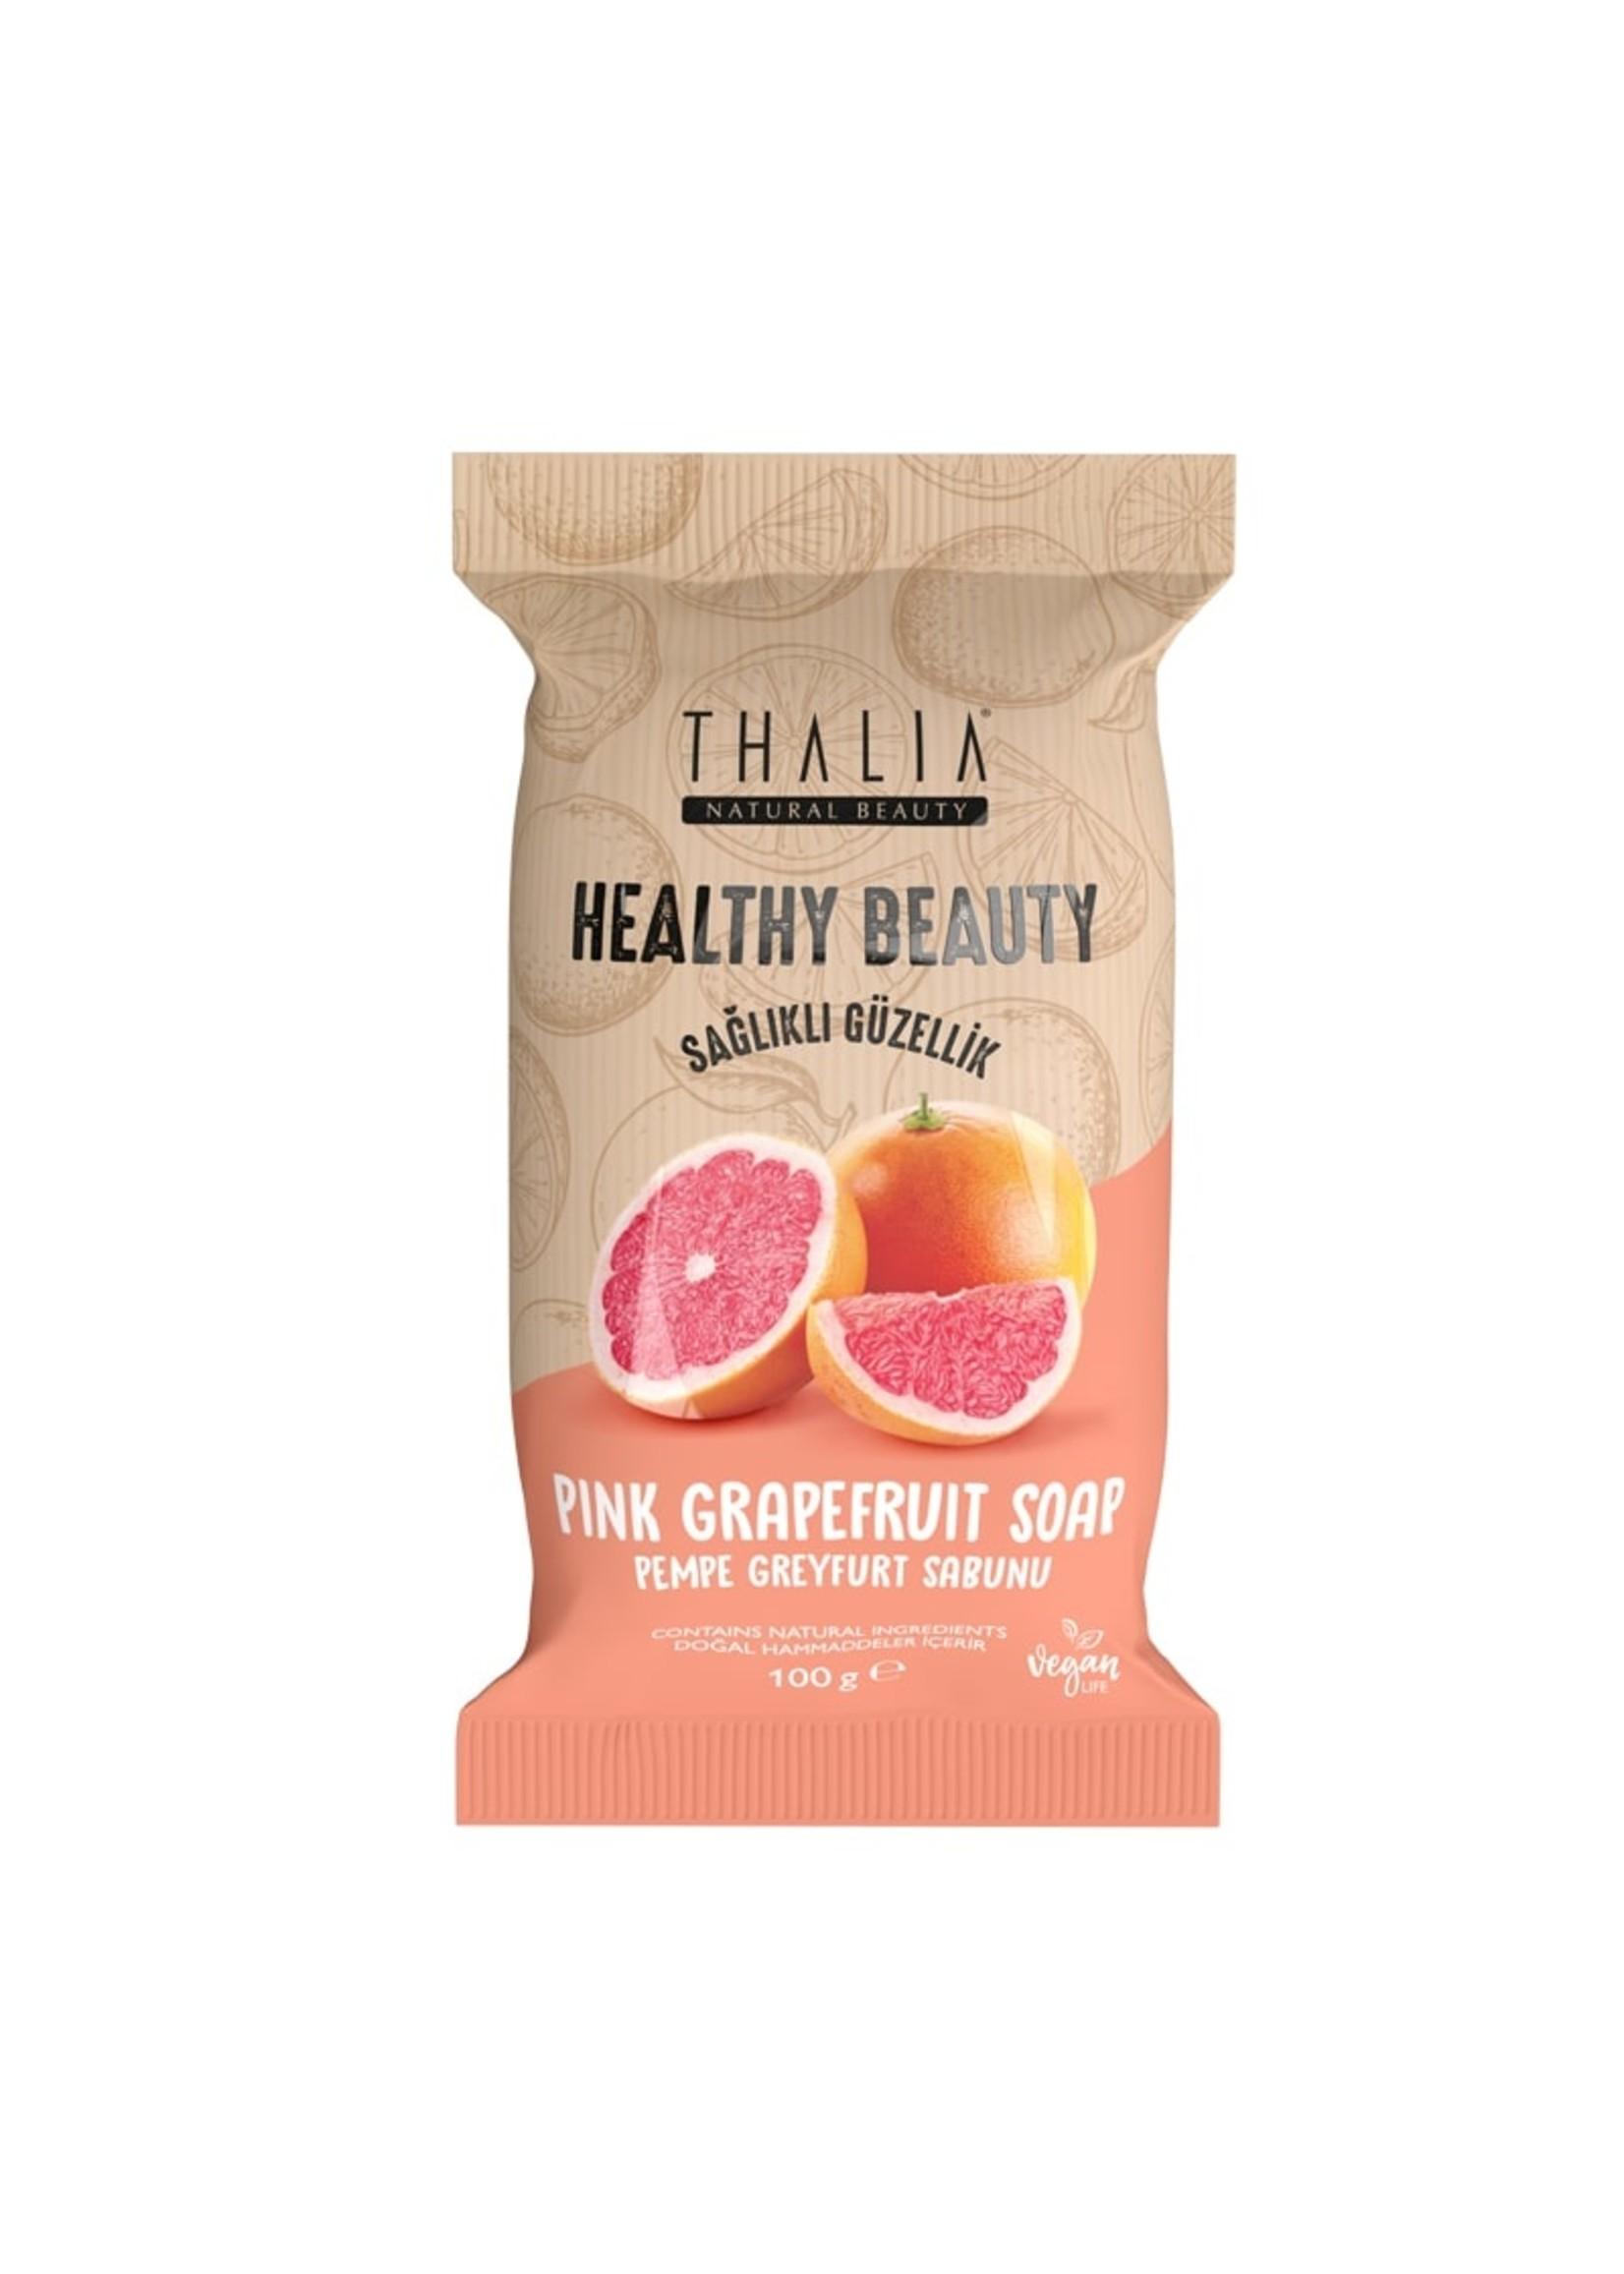 Thalia Thalia Healthy&Beauty Pembe Greyfurt Sabunu - 100 gr